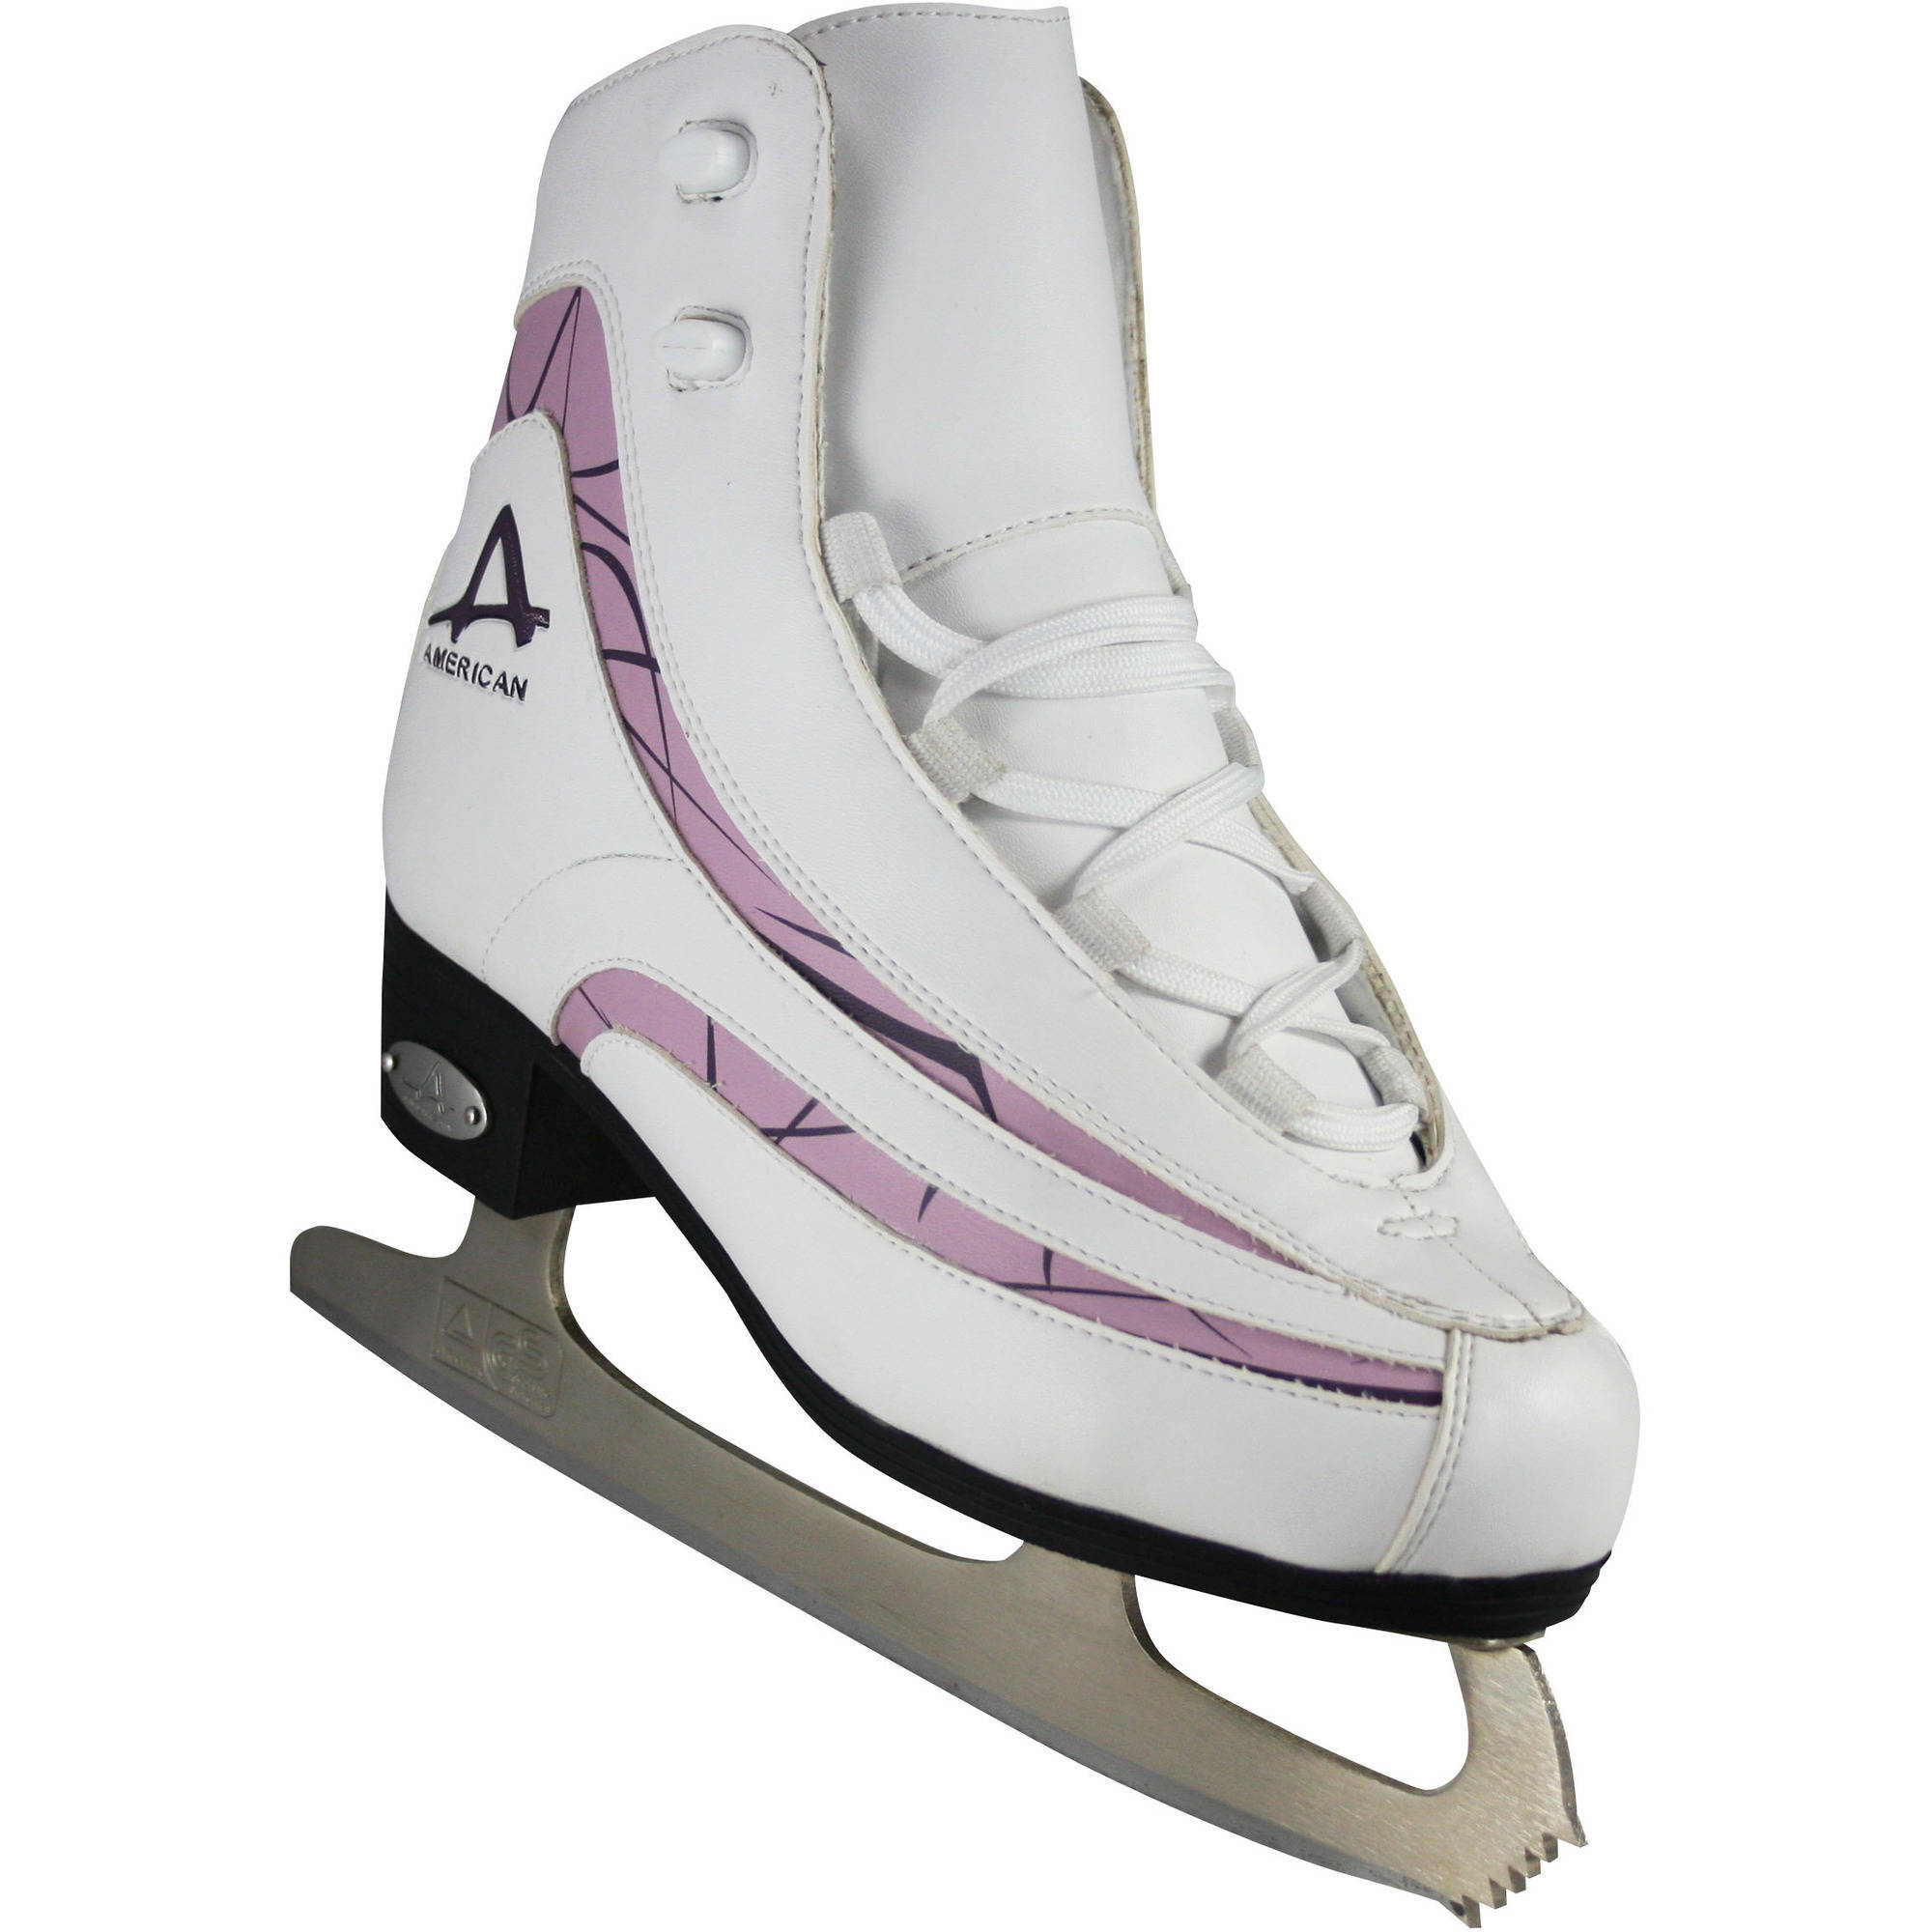 American Women's Softboot Figure Skates